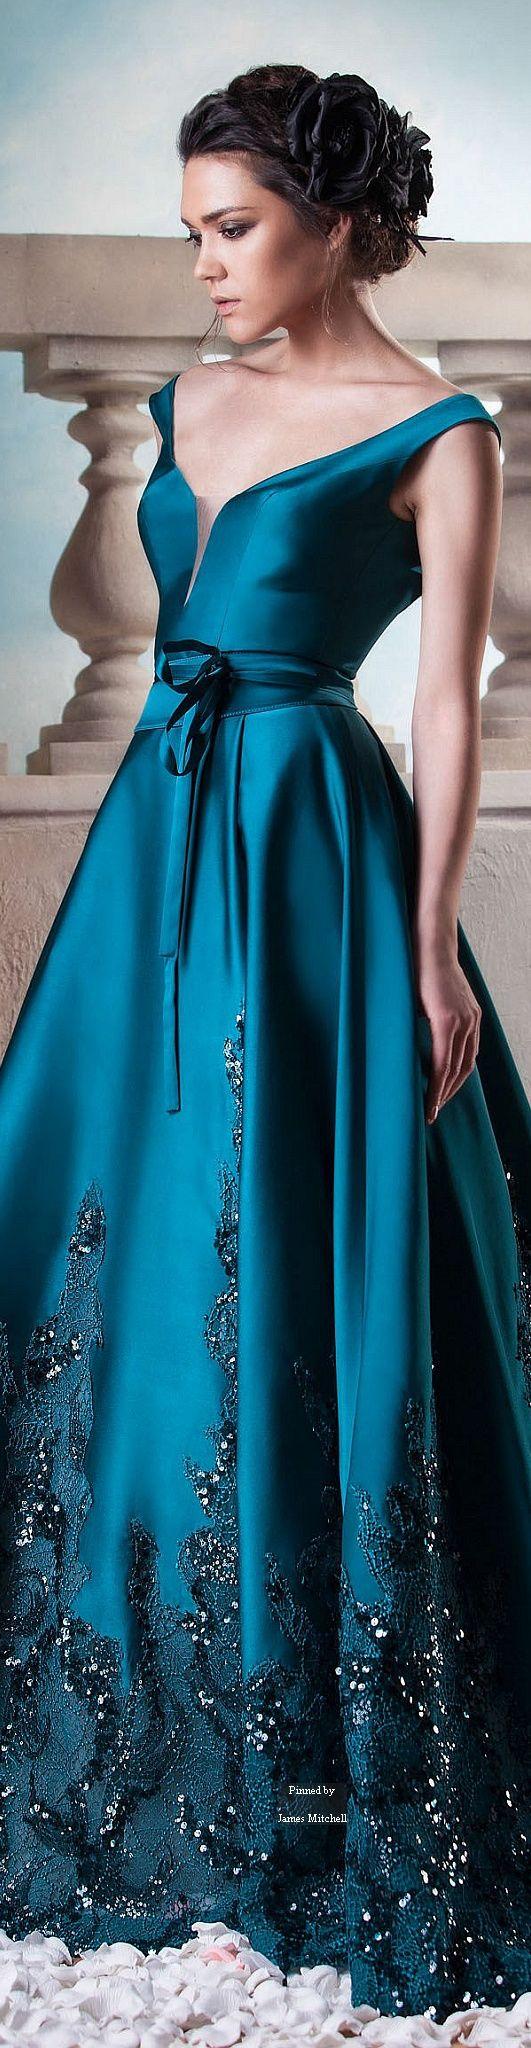 STUNNING HANNA TOUMA DRESS | Hanna Touma Couture - Luxury fashion and glamour |-pretty woman in royal blue evening gown | www.bocadolobo.com/ #luxurybrands #luxurylifestyle #exclusive